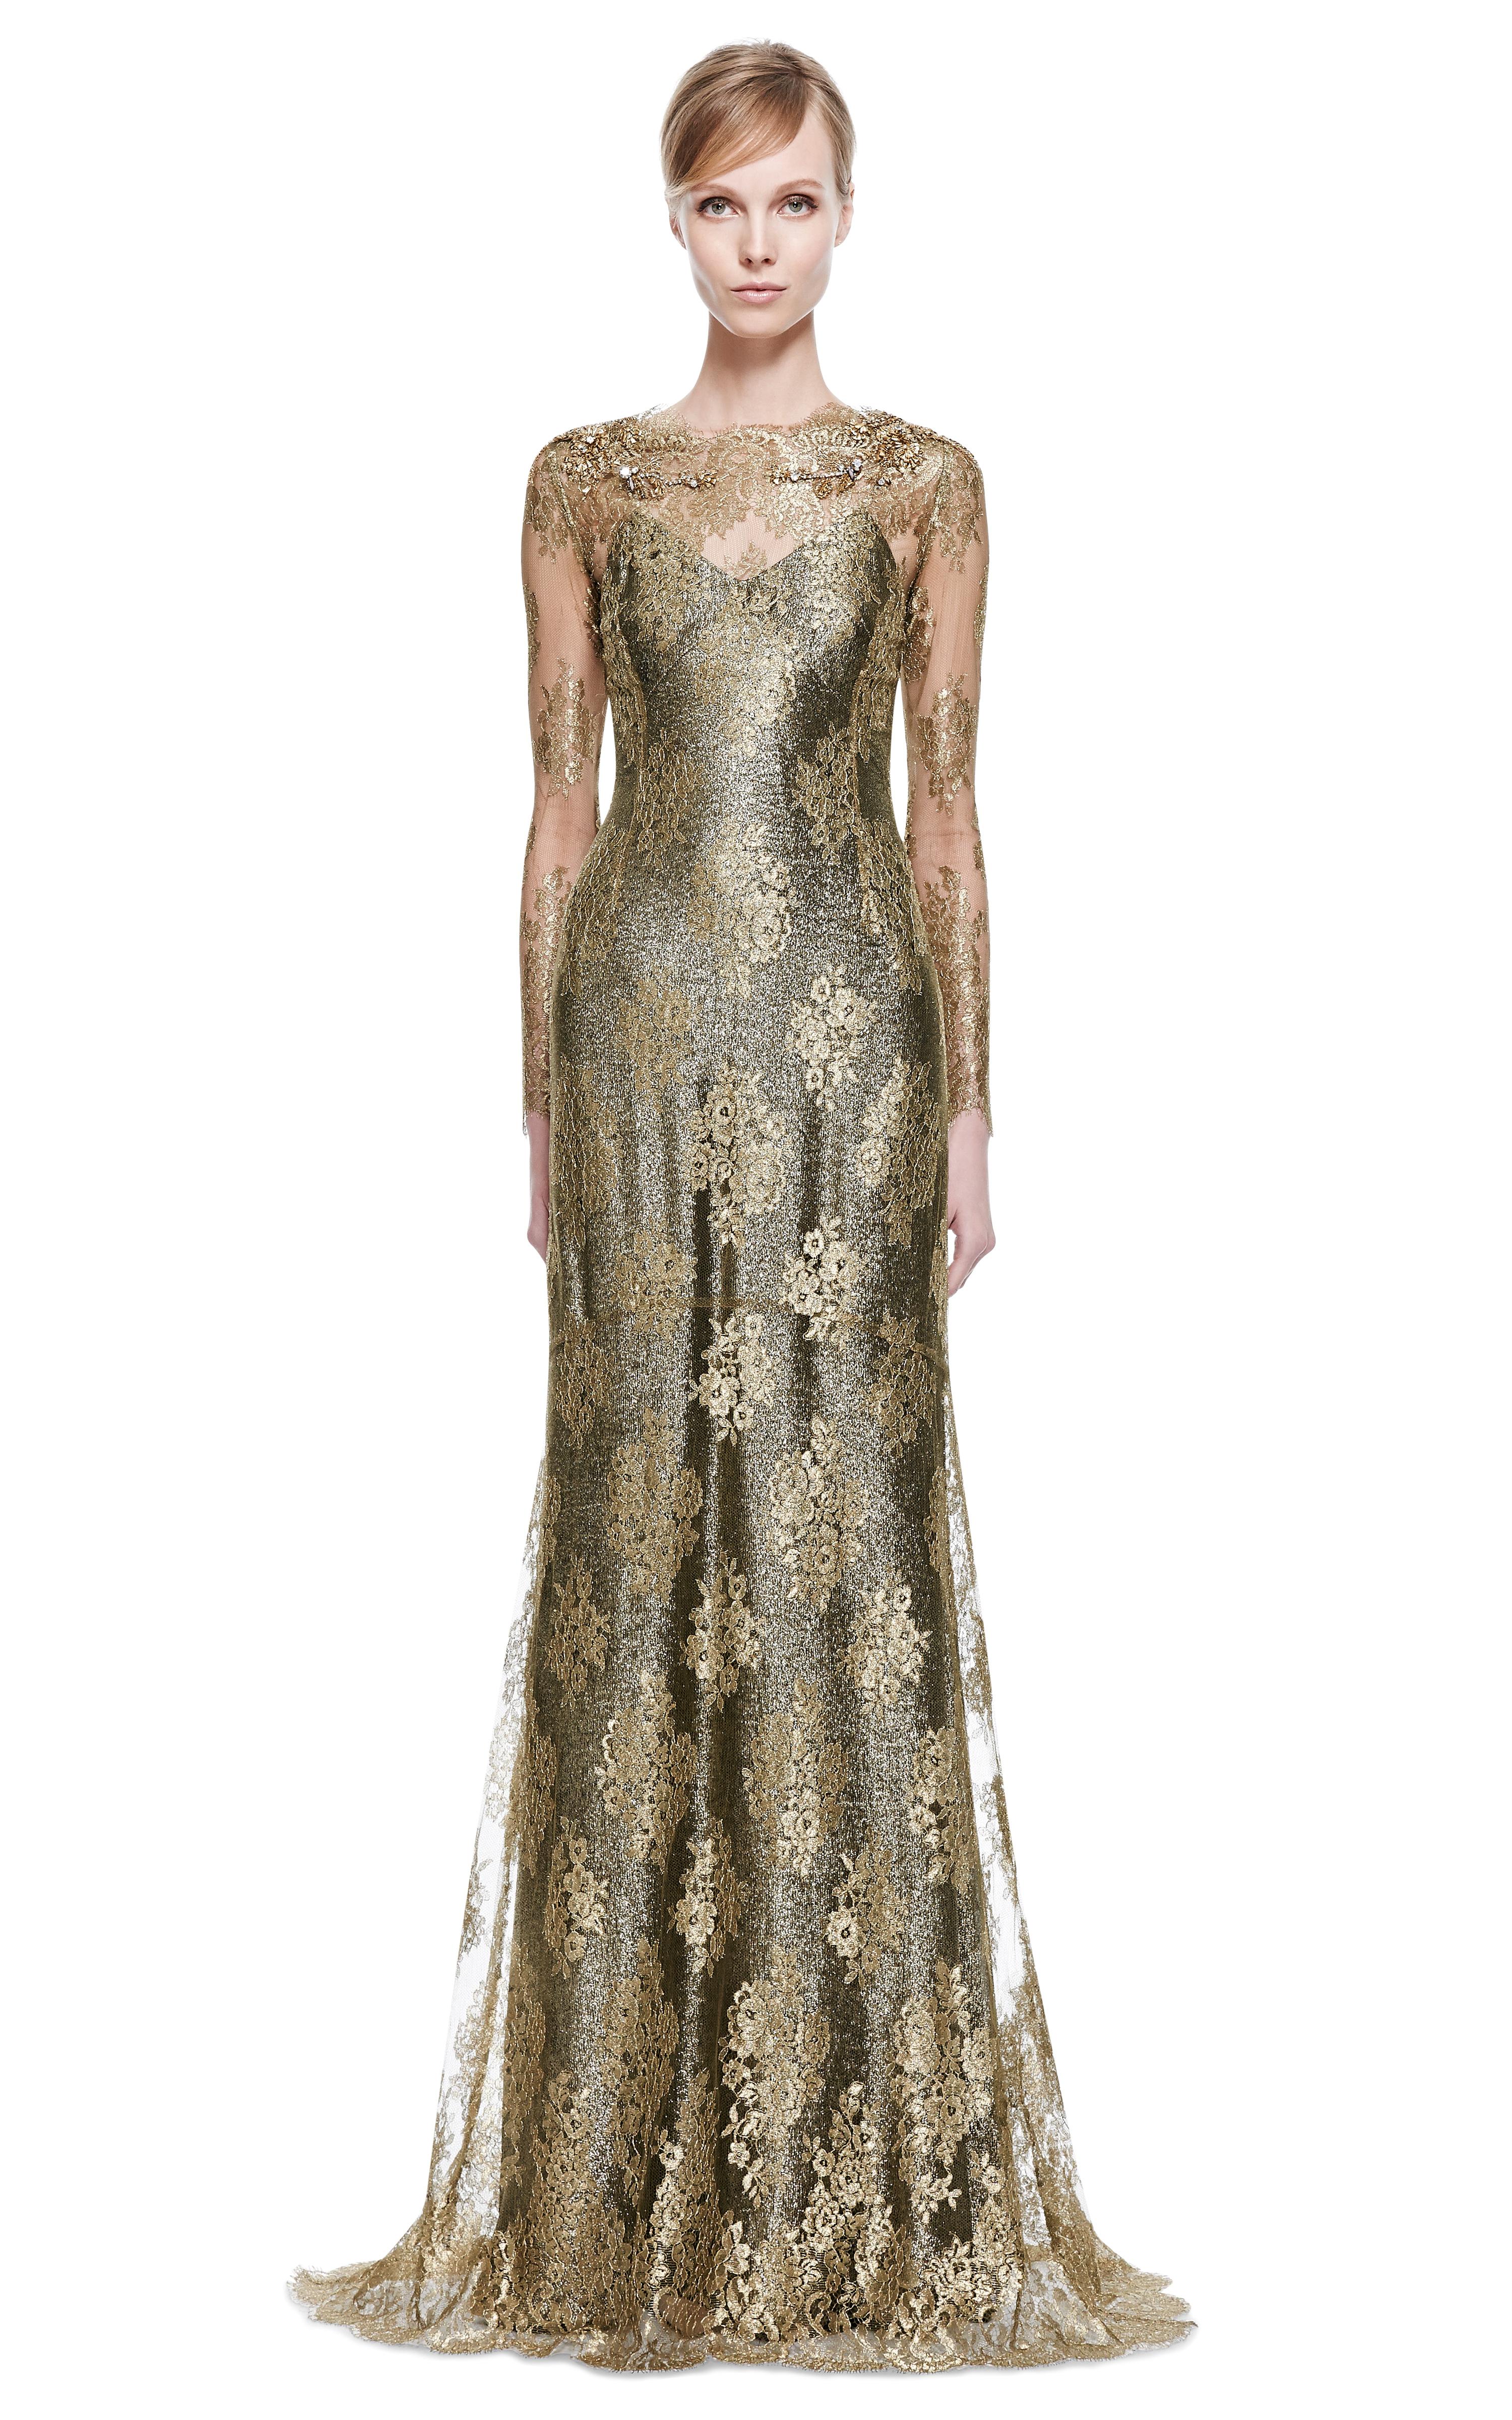 Lyst - Marchesa Gold Metallic Lace Column Gown in Metallic